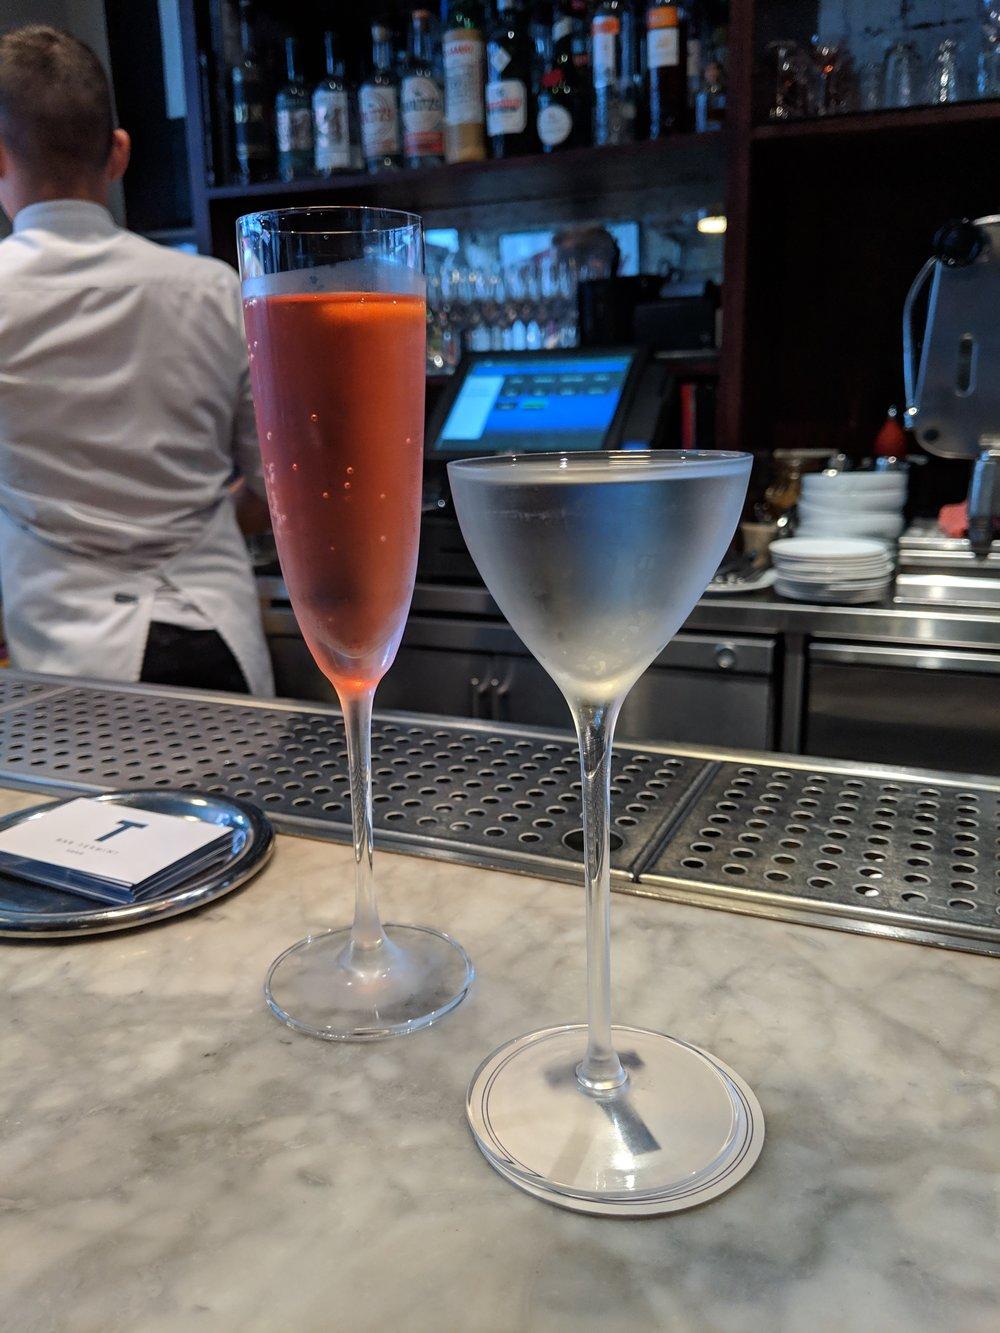 Bar termini cocktails: Spritz (left) and Terroir (right). Both excellent, but not un-expected.